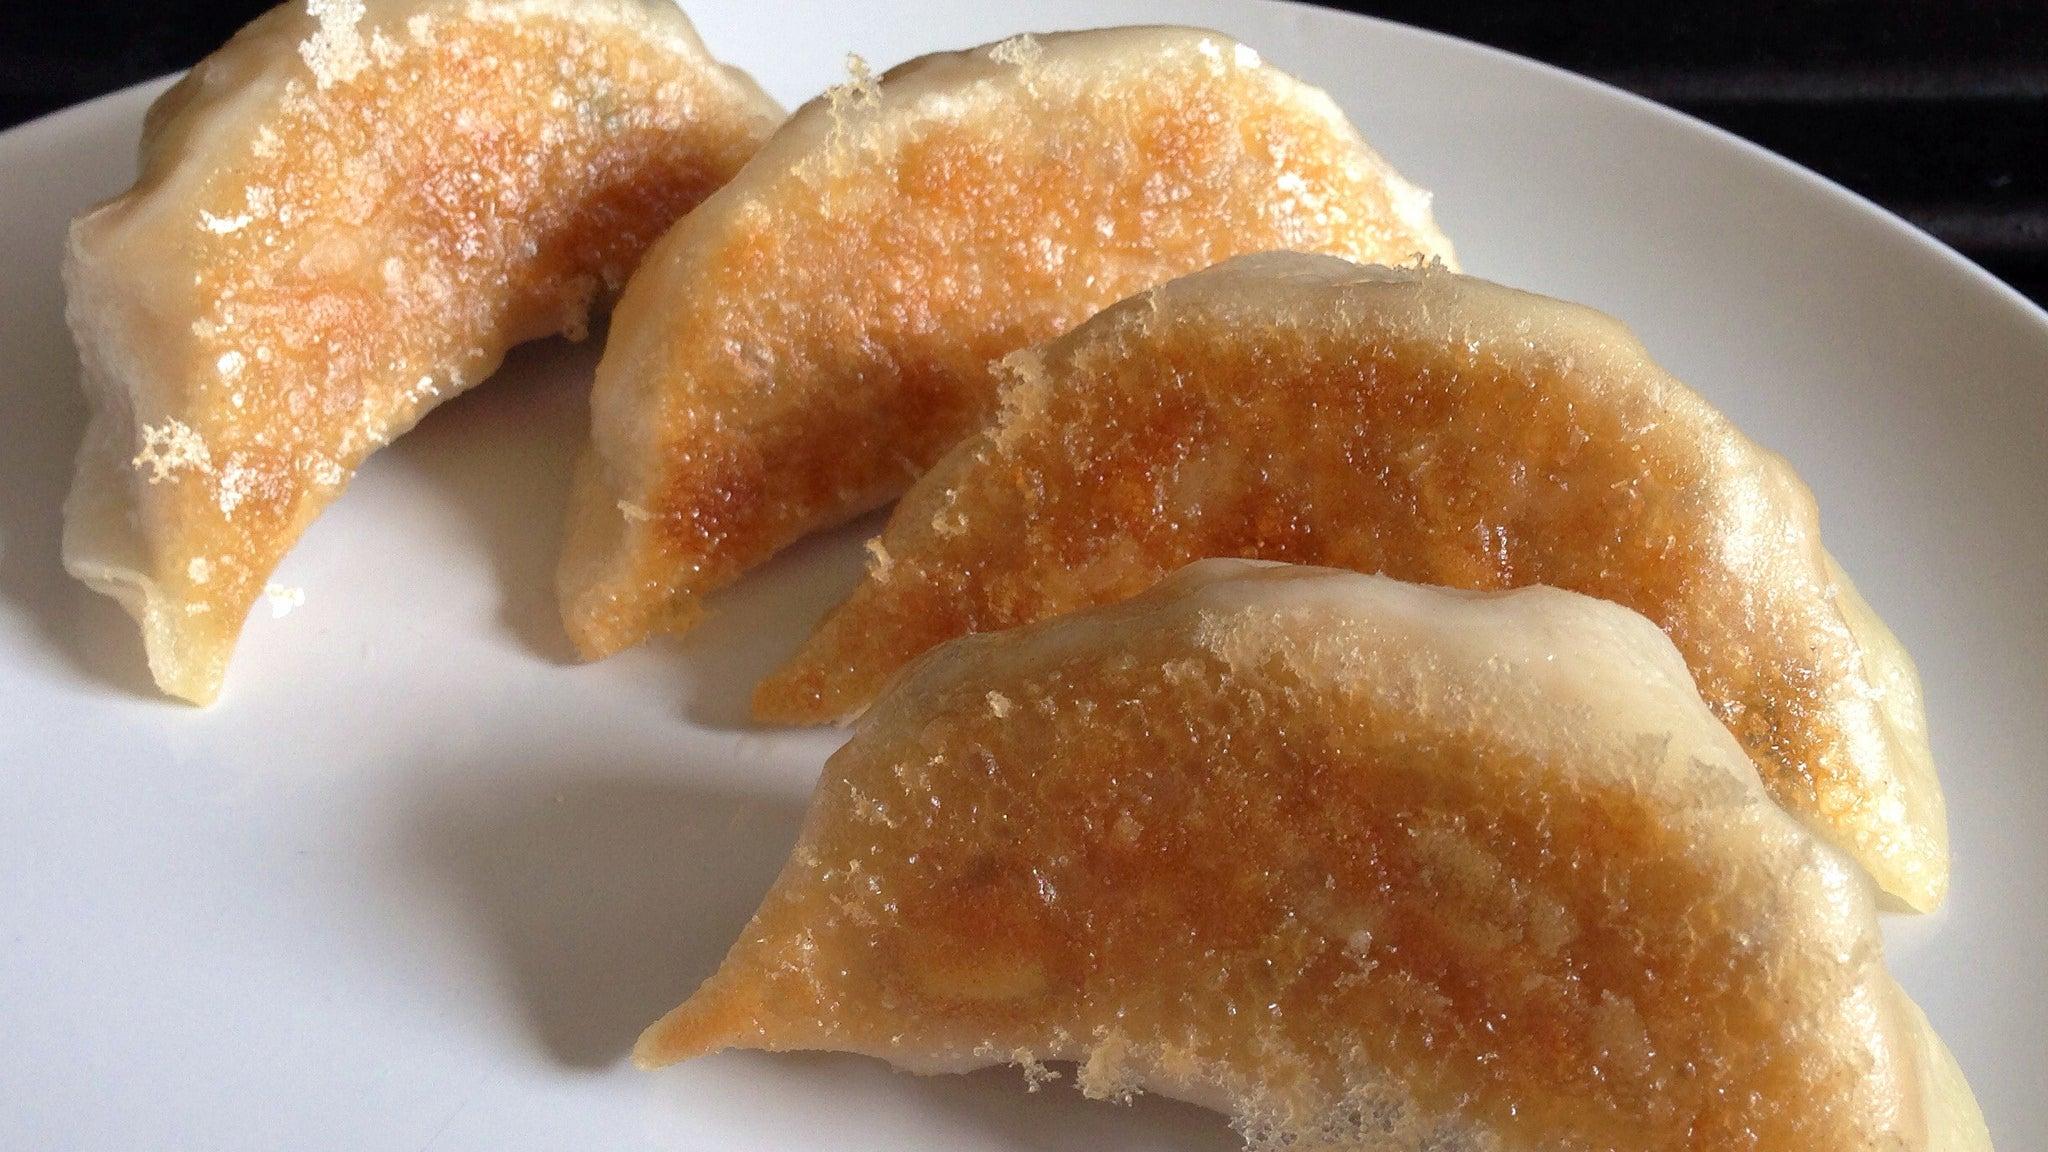 Steam-Fry' Frozen Dumplings And Potstickers For Perfectly Crispy Skin ...